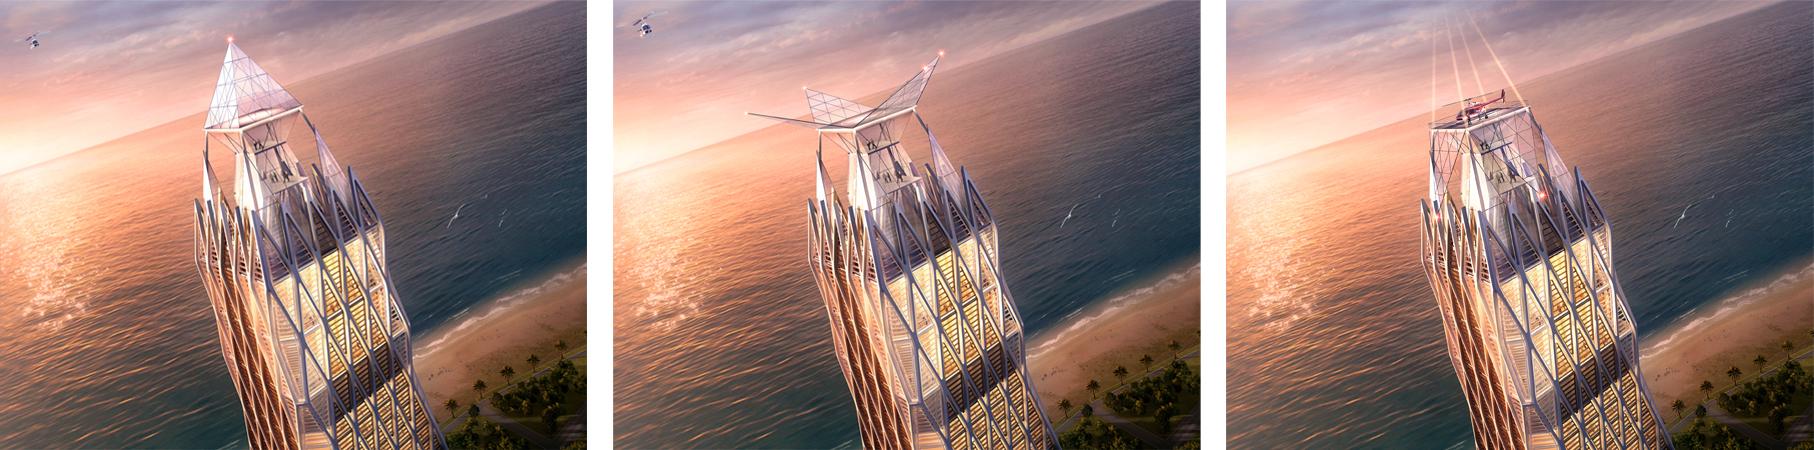 WKK Ad Astra Tower Batumi 2.jpg